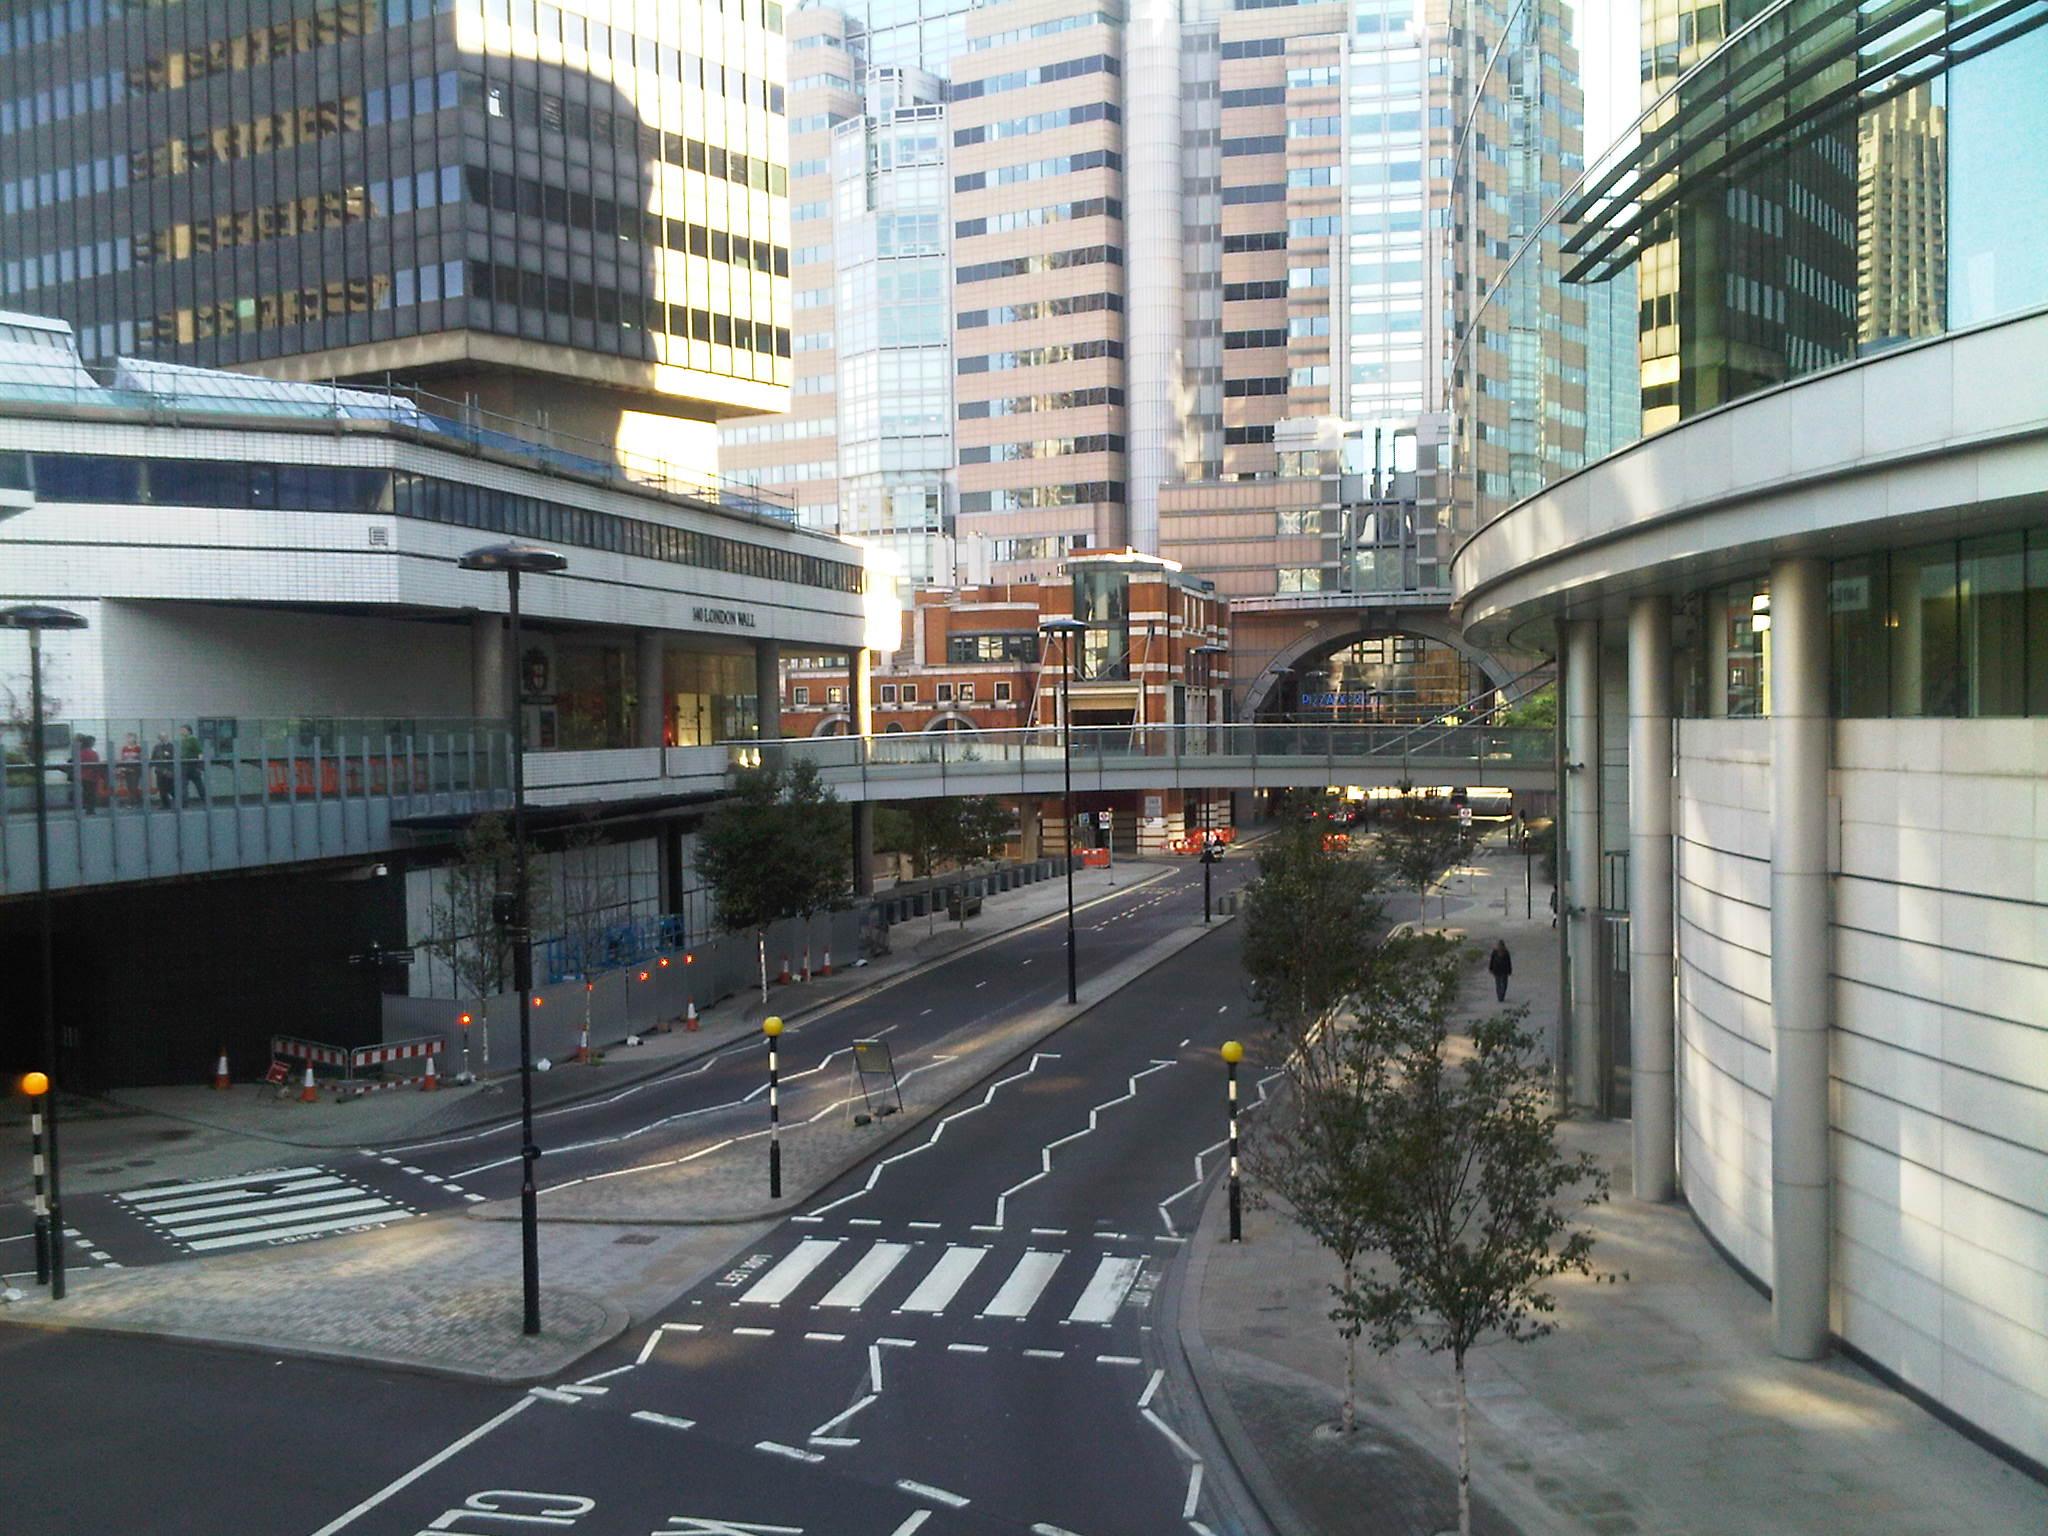 Wall street forex london